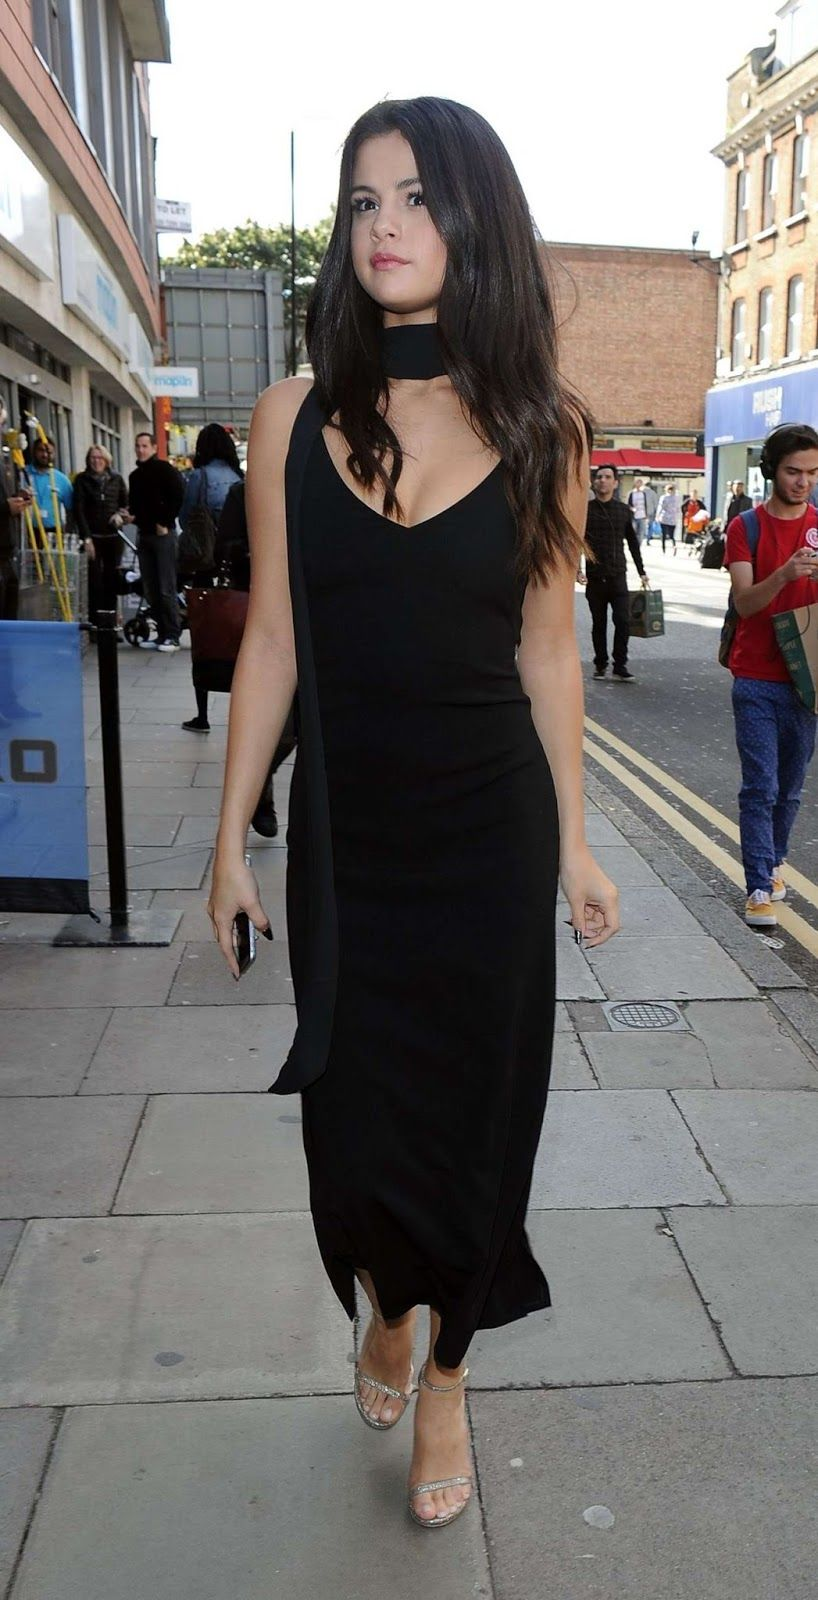 Selena Gomez Struts In Style A Black Dress London